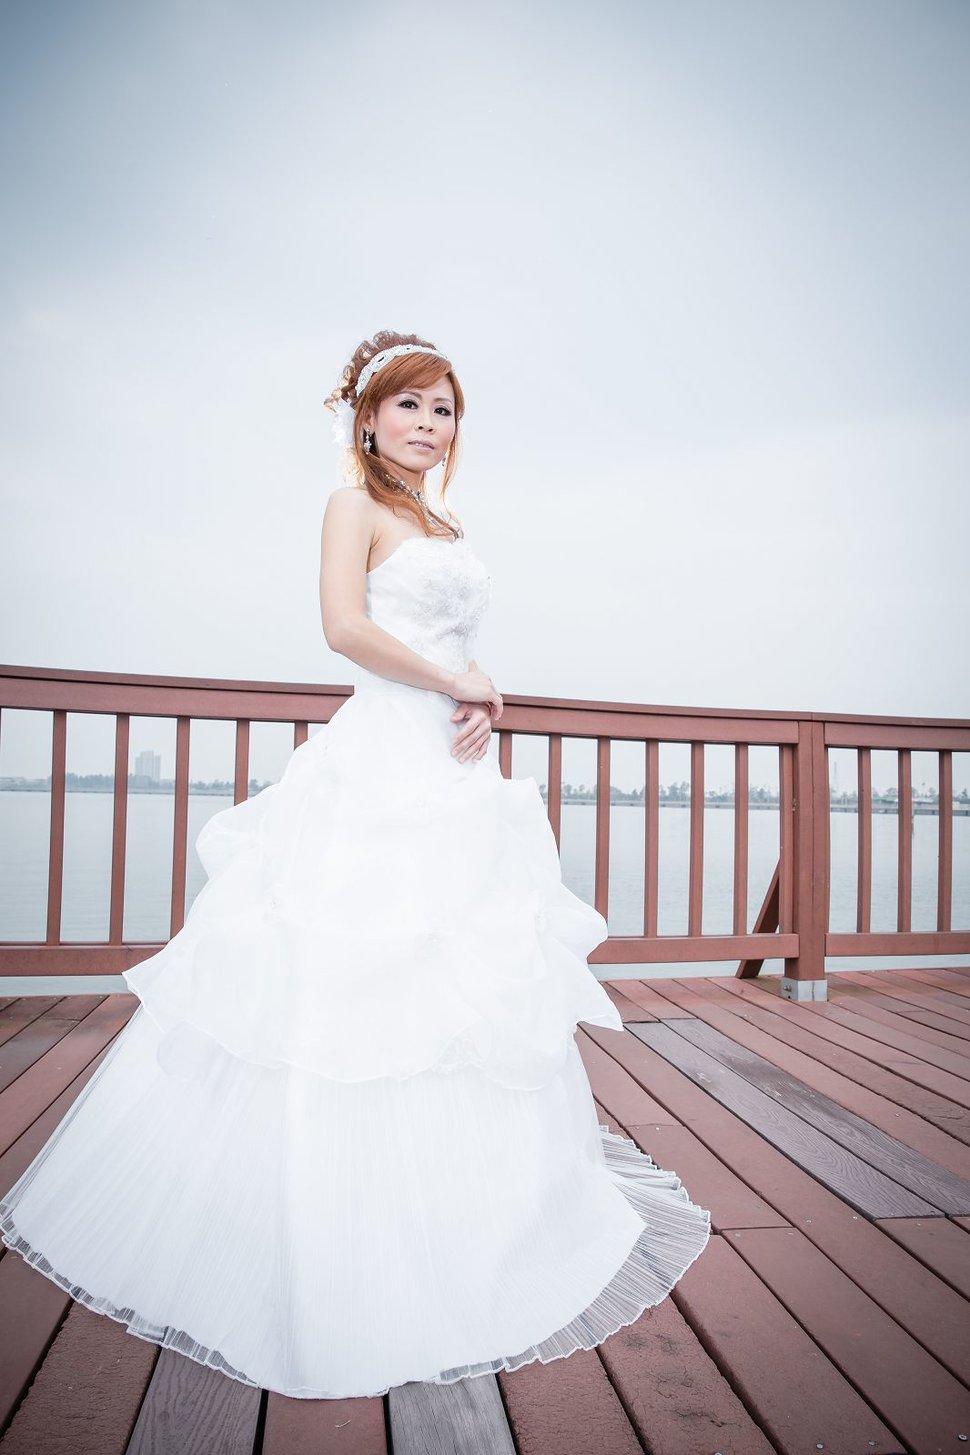 _MG_5966 - 全台最便宜-45DESIGN四五婚紗禮服《結婚吧》